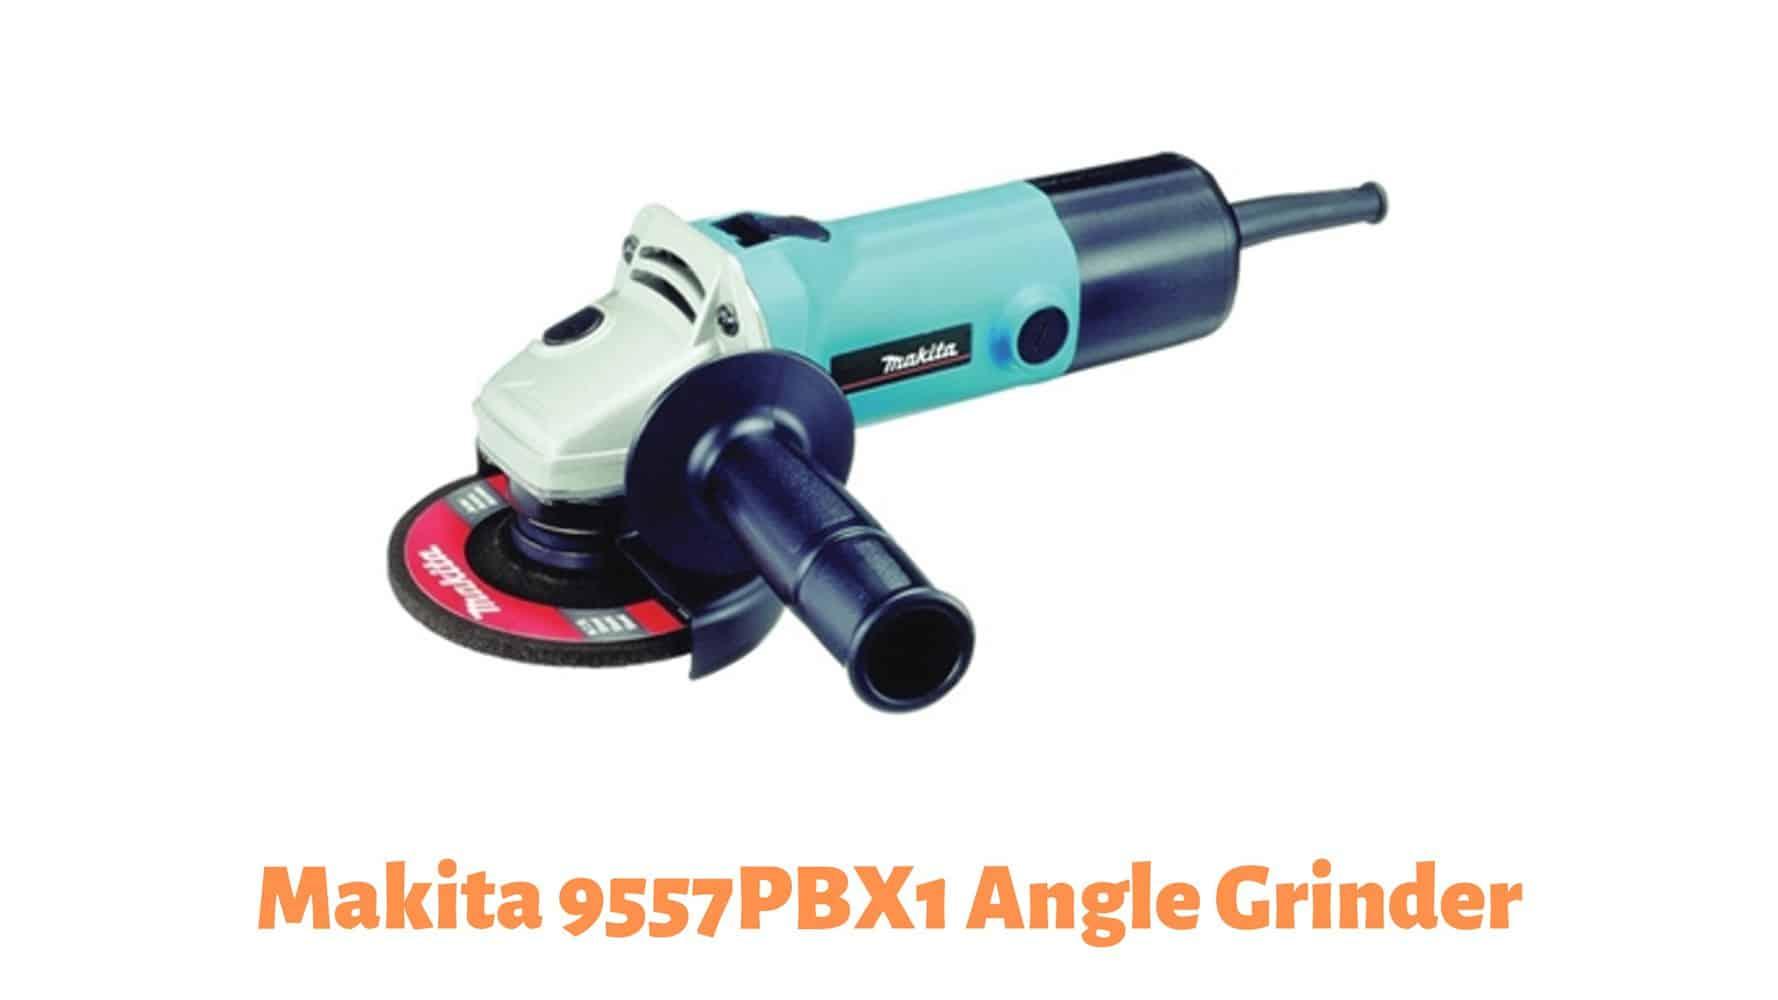 Makita 9557PBX1 Angle Grinder